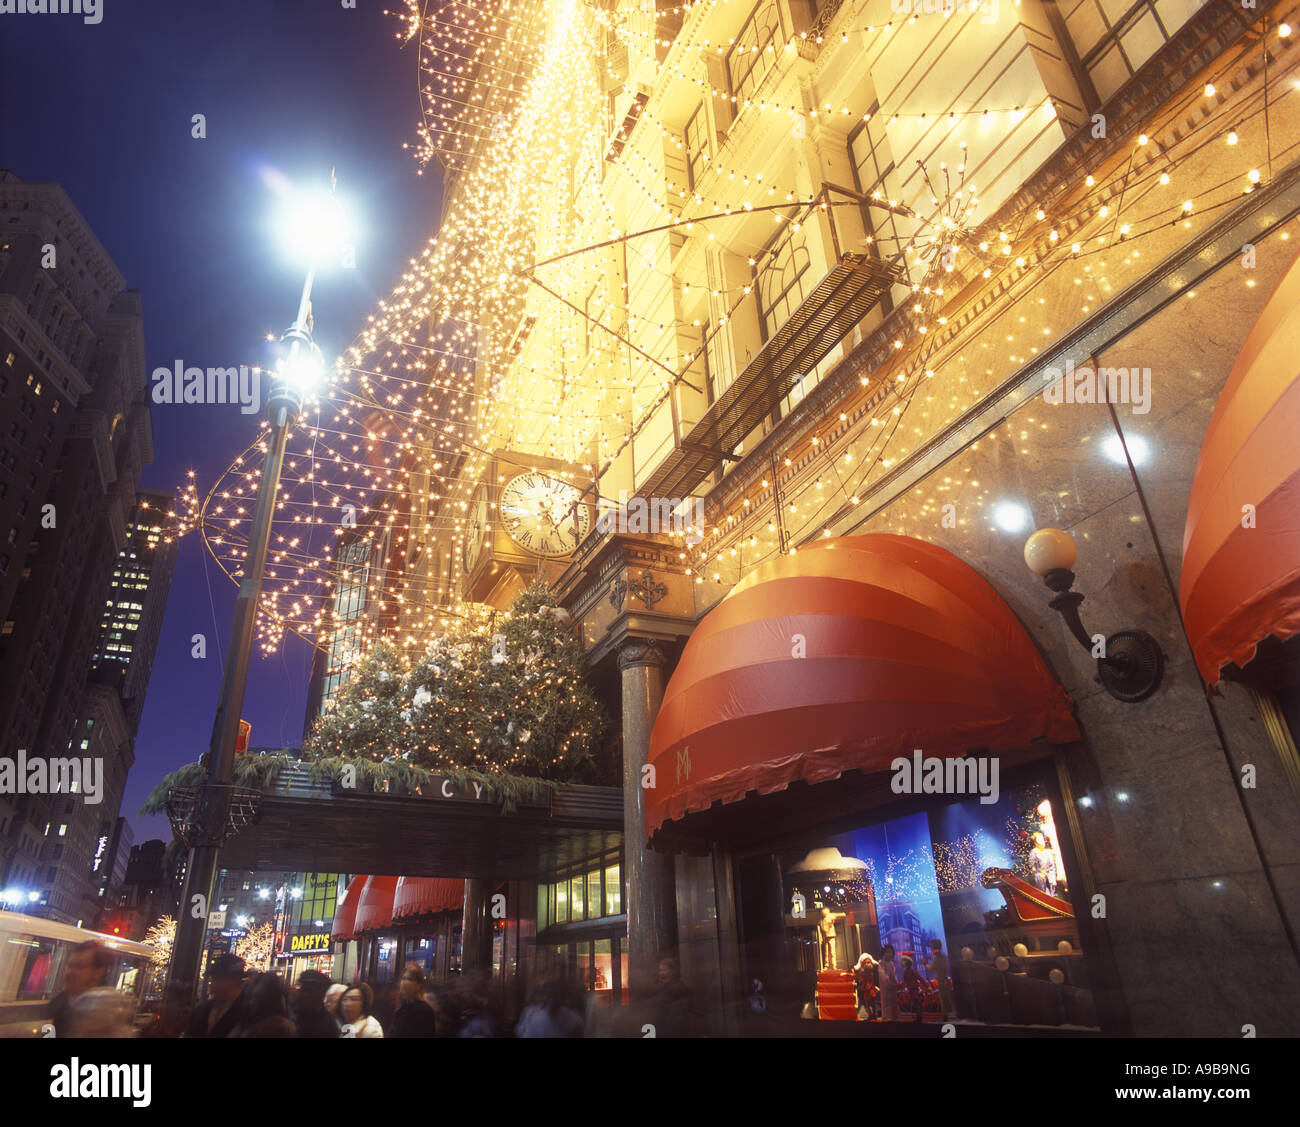 CHRISTMAS TREE LIGHTS MACYS STORE HERALD SQUARE MANHATTAN NEW YORK CITY USA